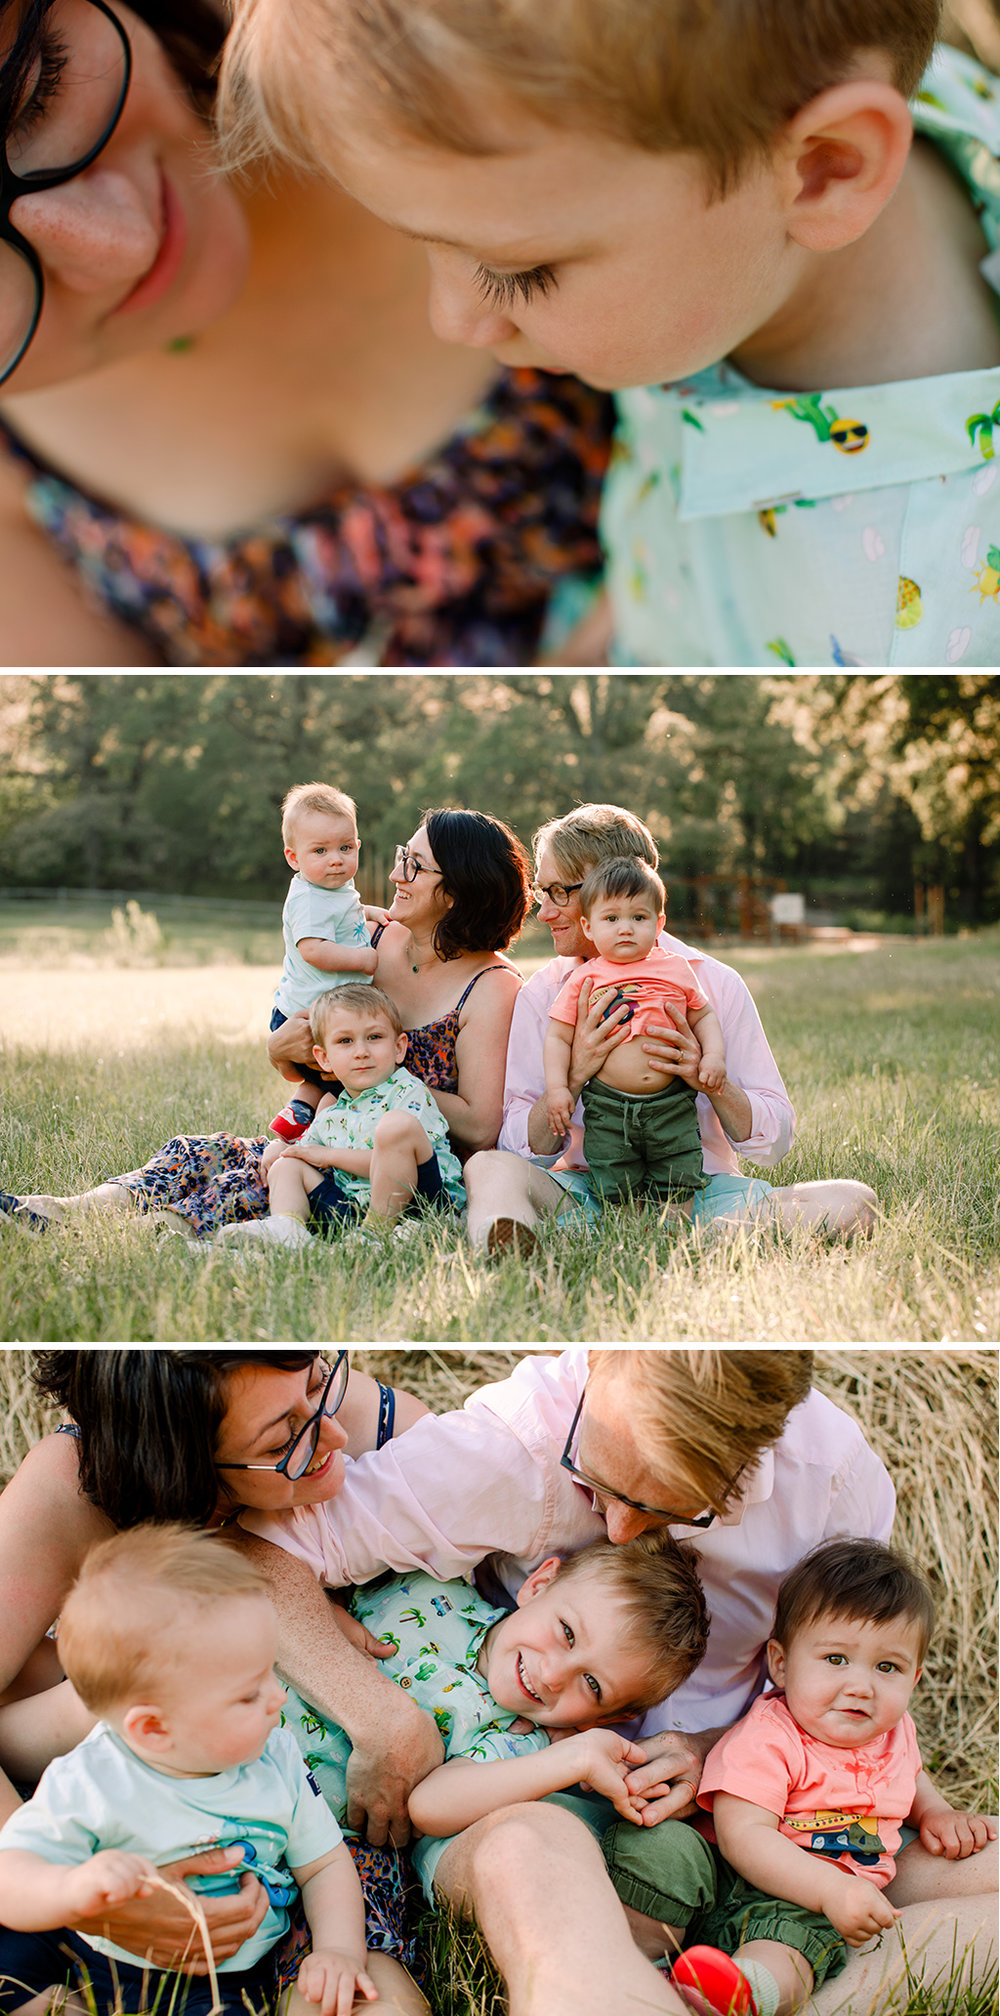 Sommar-familjefotografering_Stockholm_Anna_Sandstrom_7.jpg